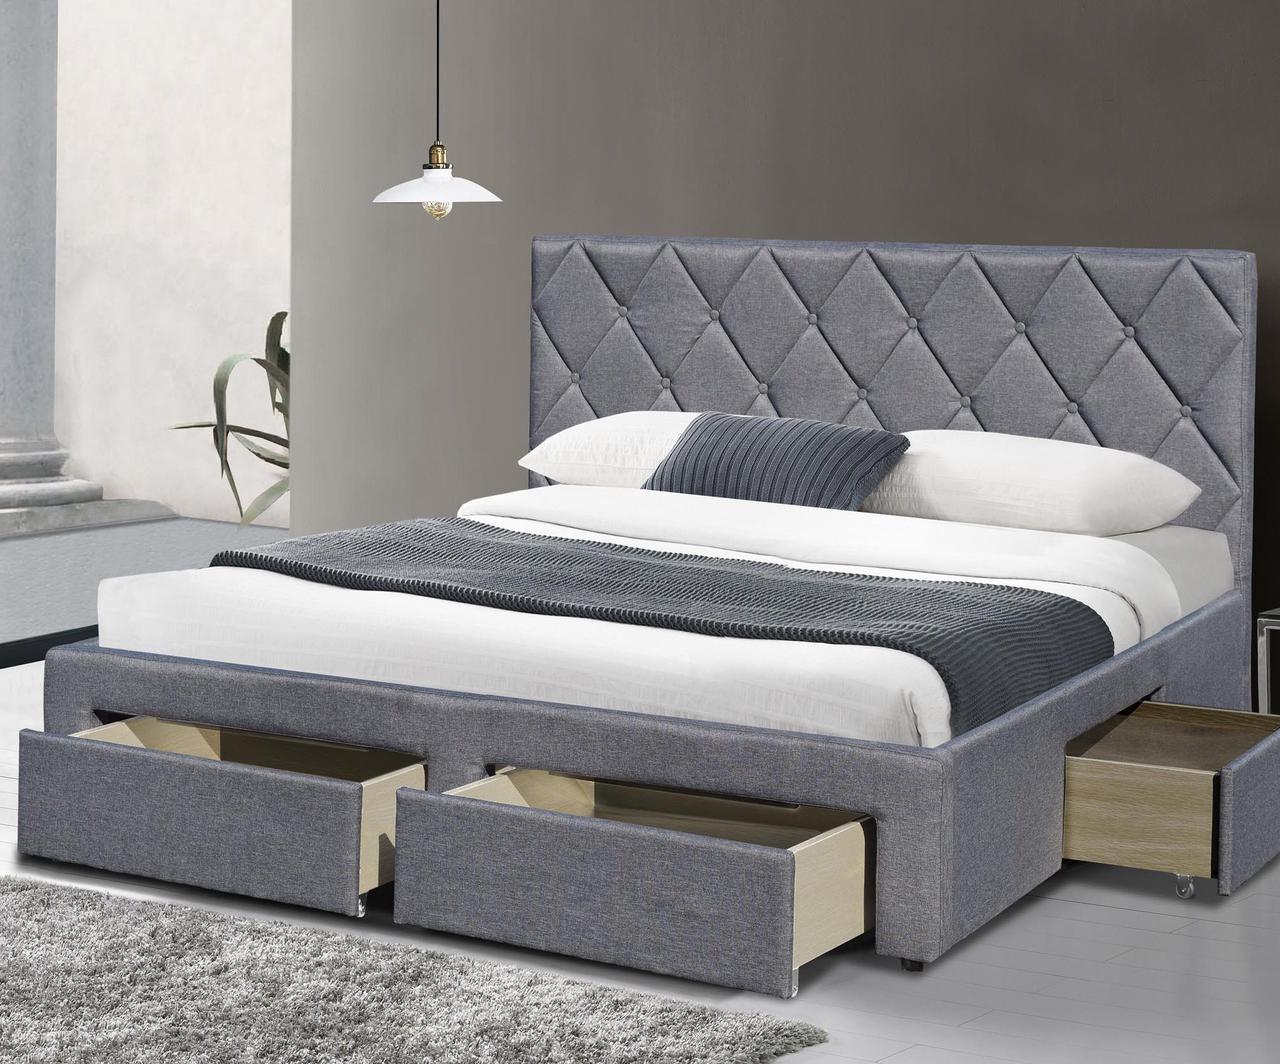 Ліжко двоспальне в спальню Польша Betina 160*200 Halmar